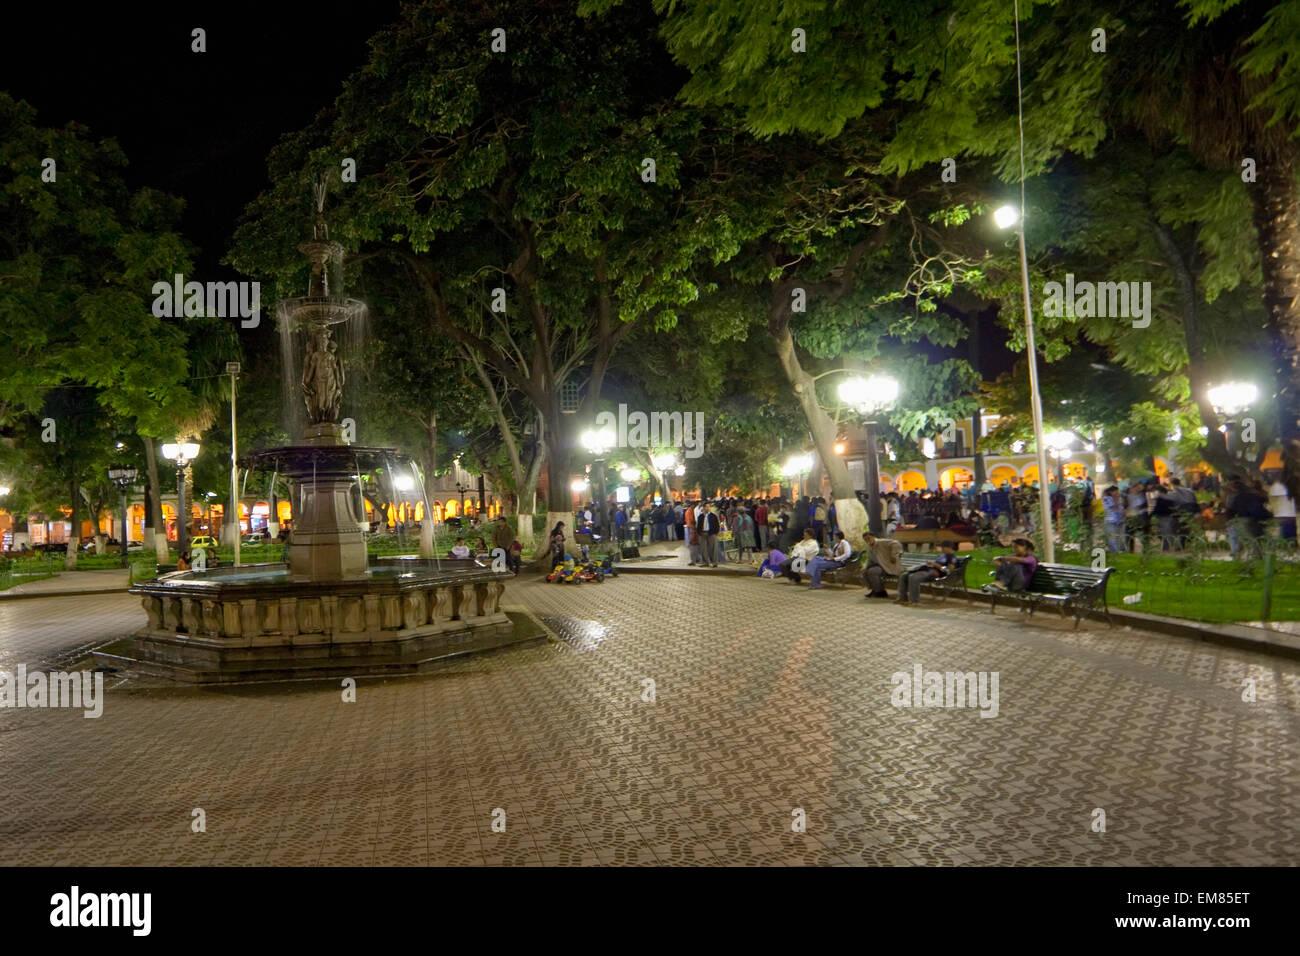 Fountain On Plaza 14 De Septiembre At Night Cochabamba Bolivia Stock Photo Alamy